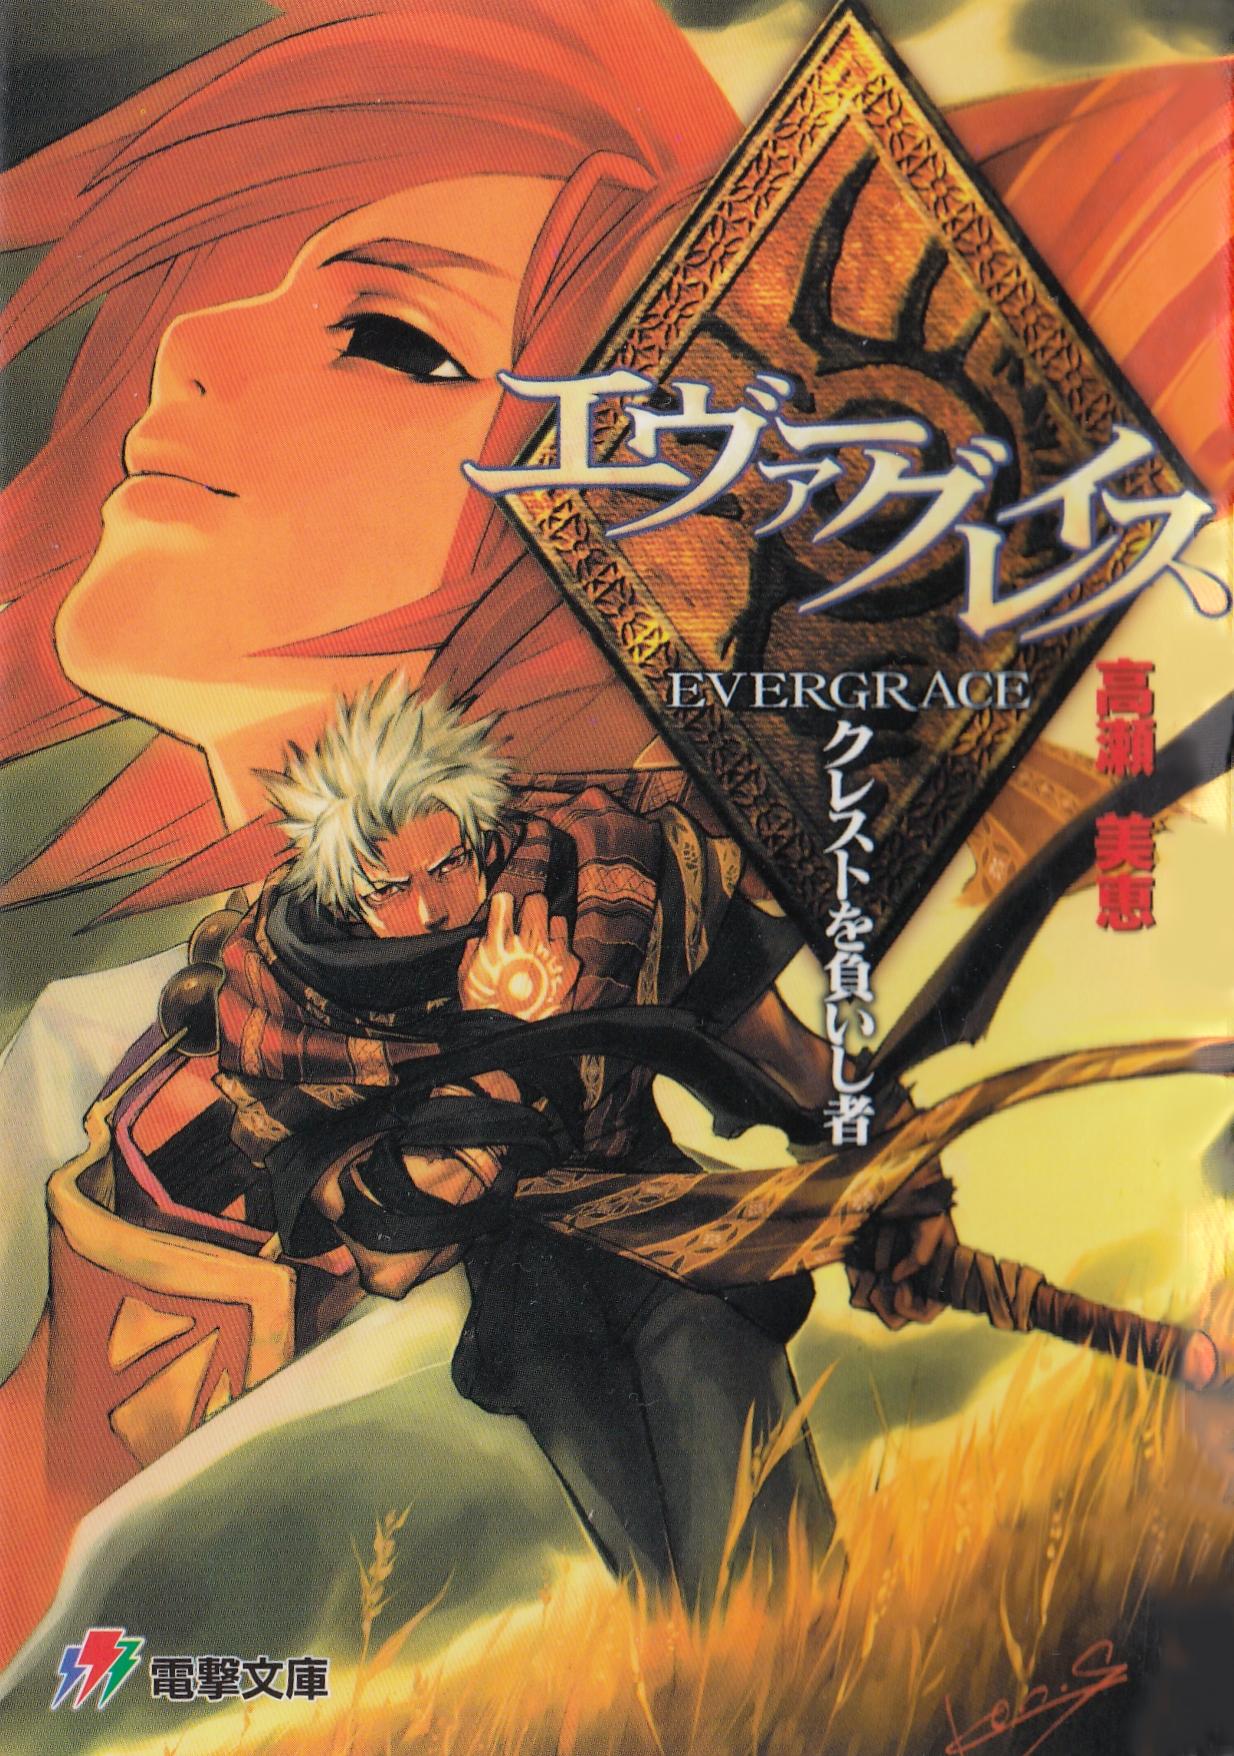 Evergrace Mie Takase